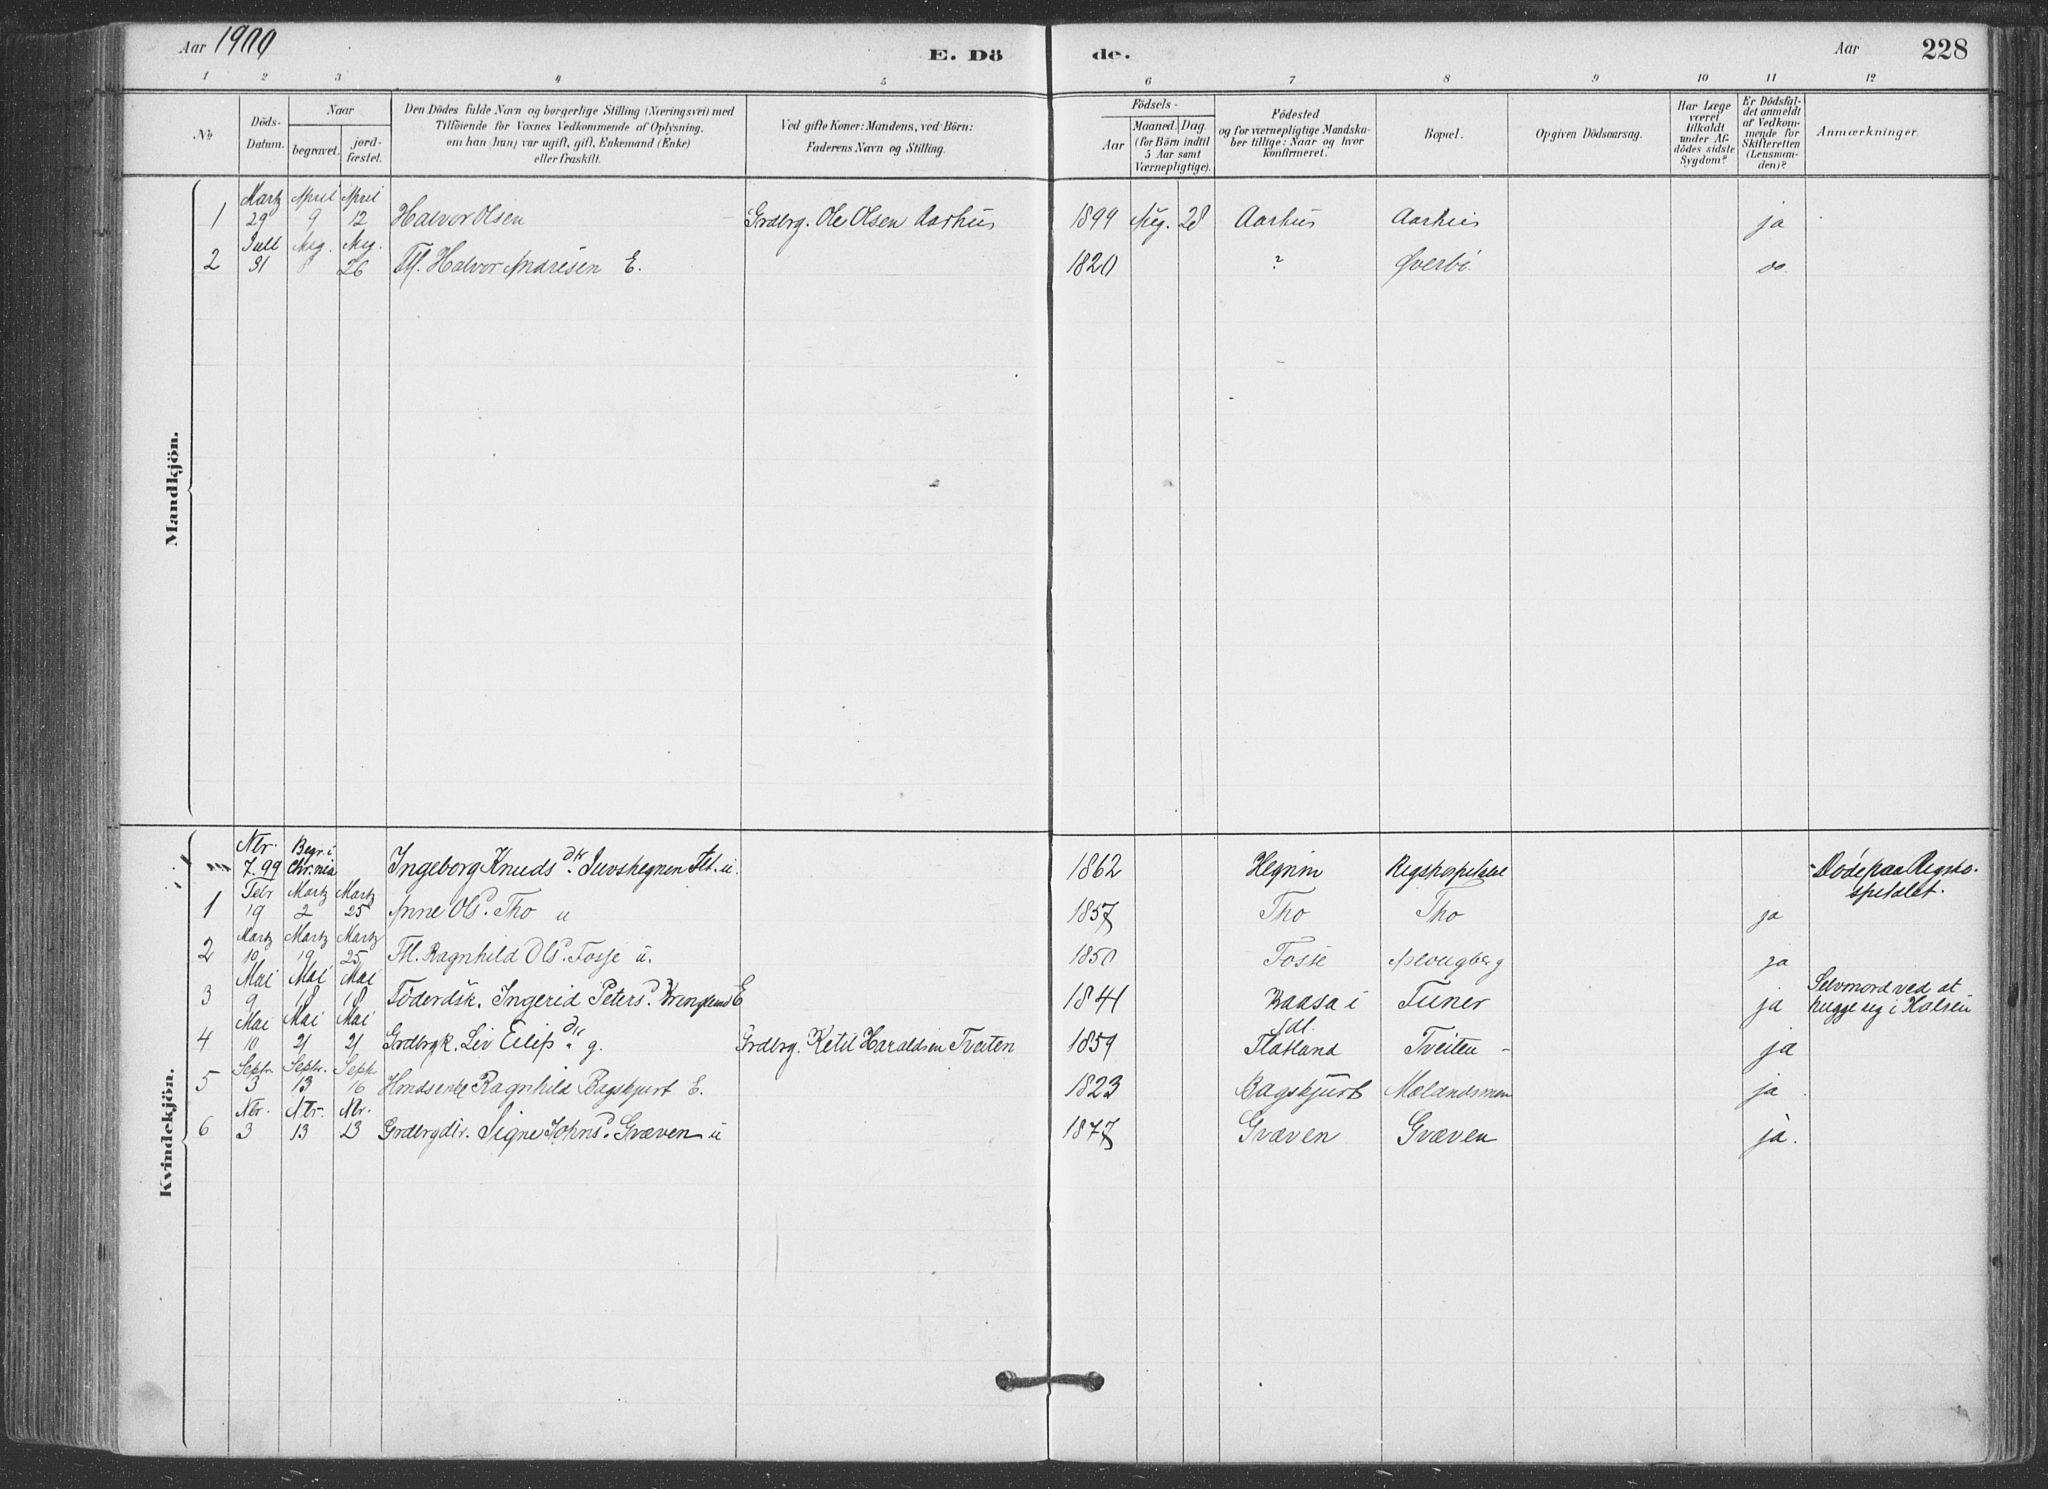 SAKO, Hjartdal kirkebøker, F/Fa/L0010: Ministerialbok nr. I 10, 1880-1929, s. 228